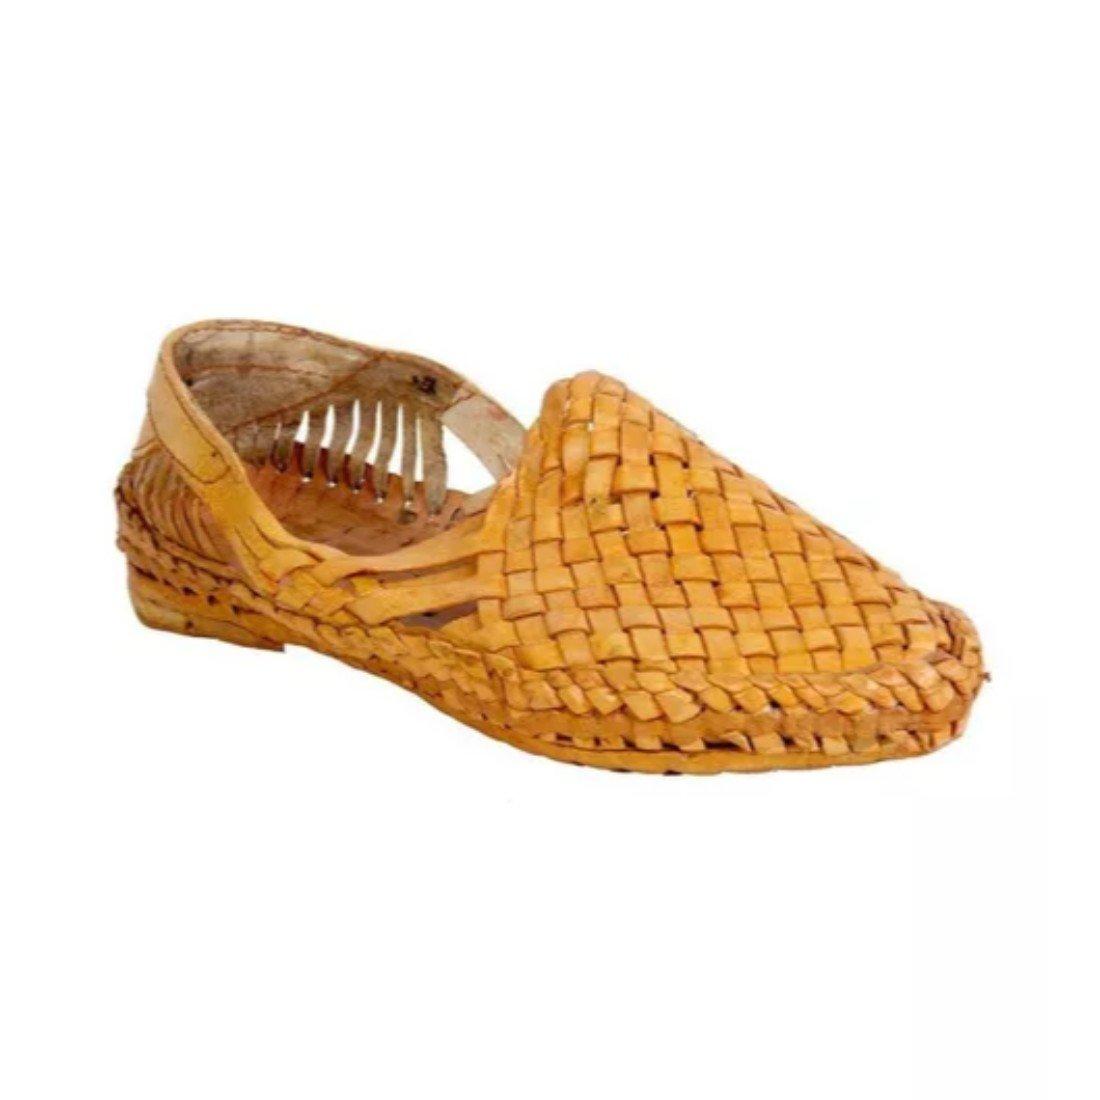 Sunlife Mart Rajwari Tan Handmade Kohlapuri Sandal Handmade Tan Indian Leather Traditional Shoes Purely Handcrafted Ethnic B07DGY5CWN Sandals a4e093